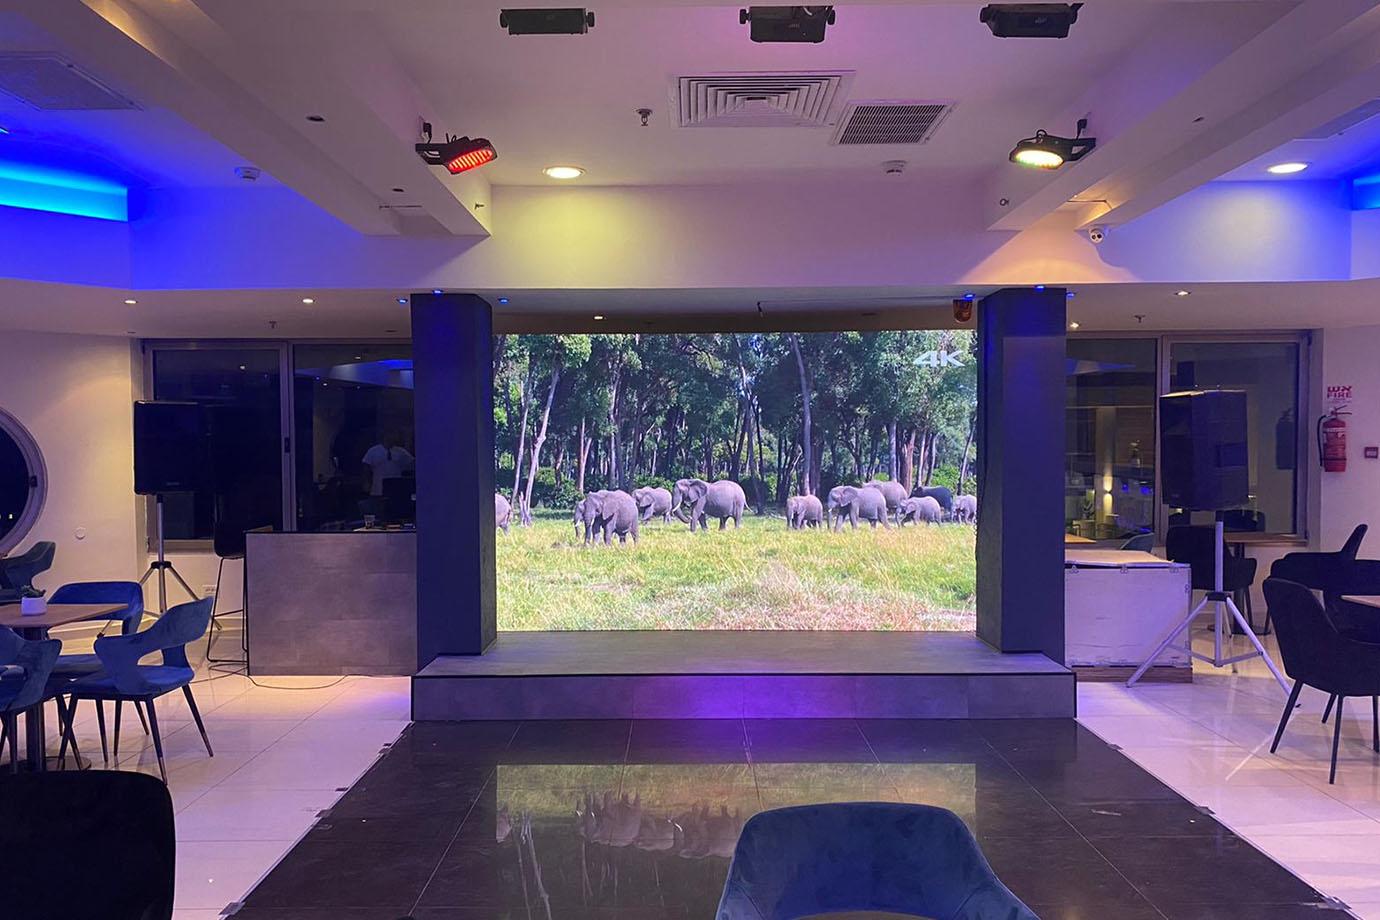 P2 LED Indoor Display in Israel